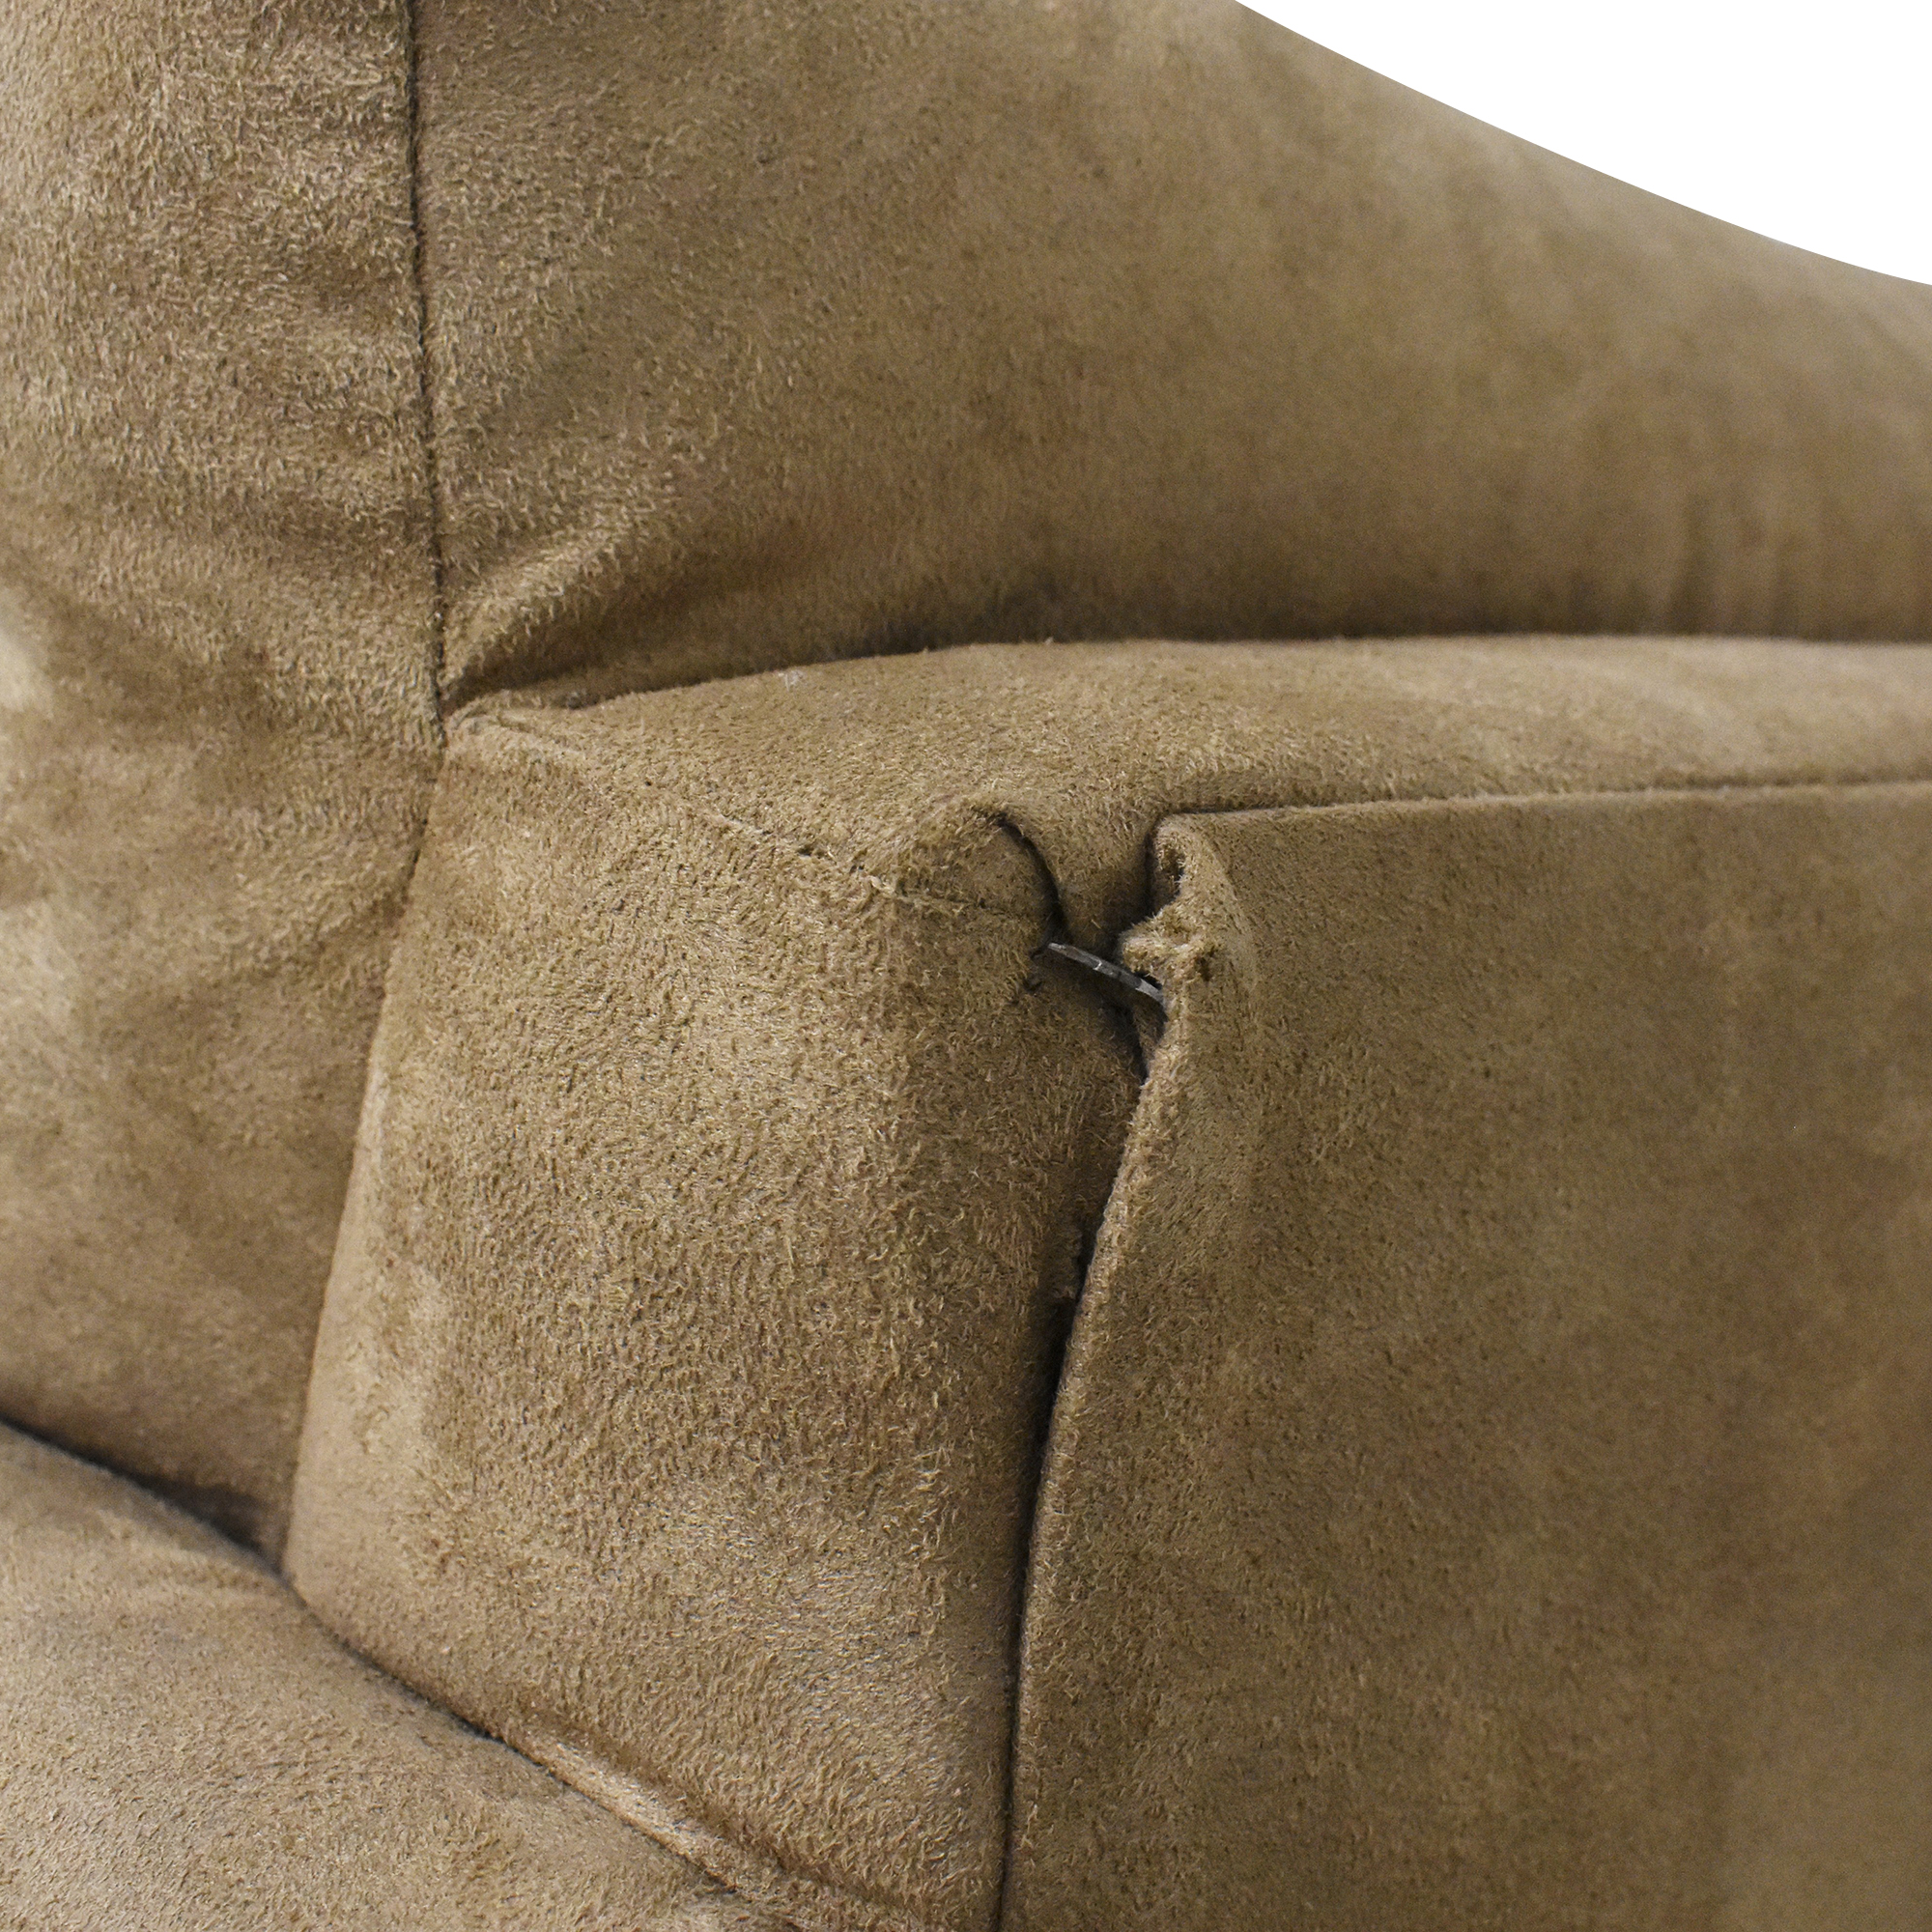 Lacrosse Furniture Two Cushion Sleeper Loveseat / Sofas